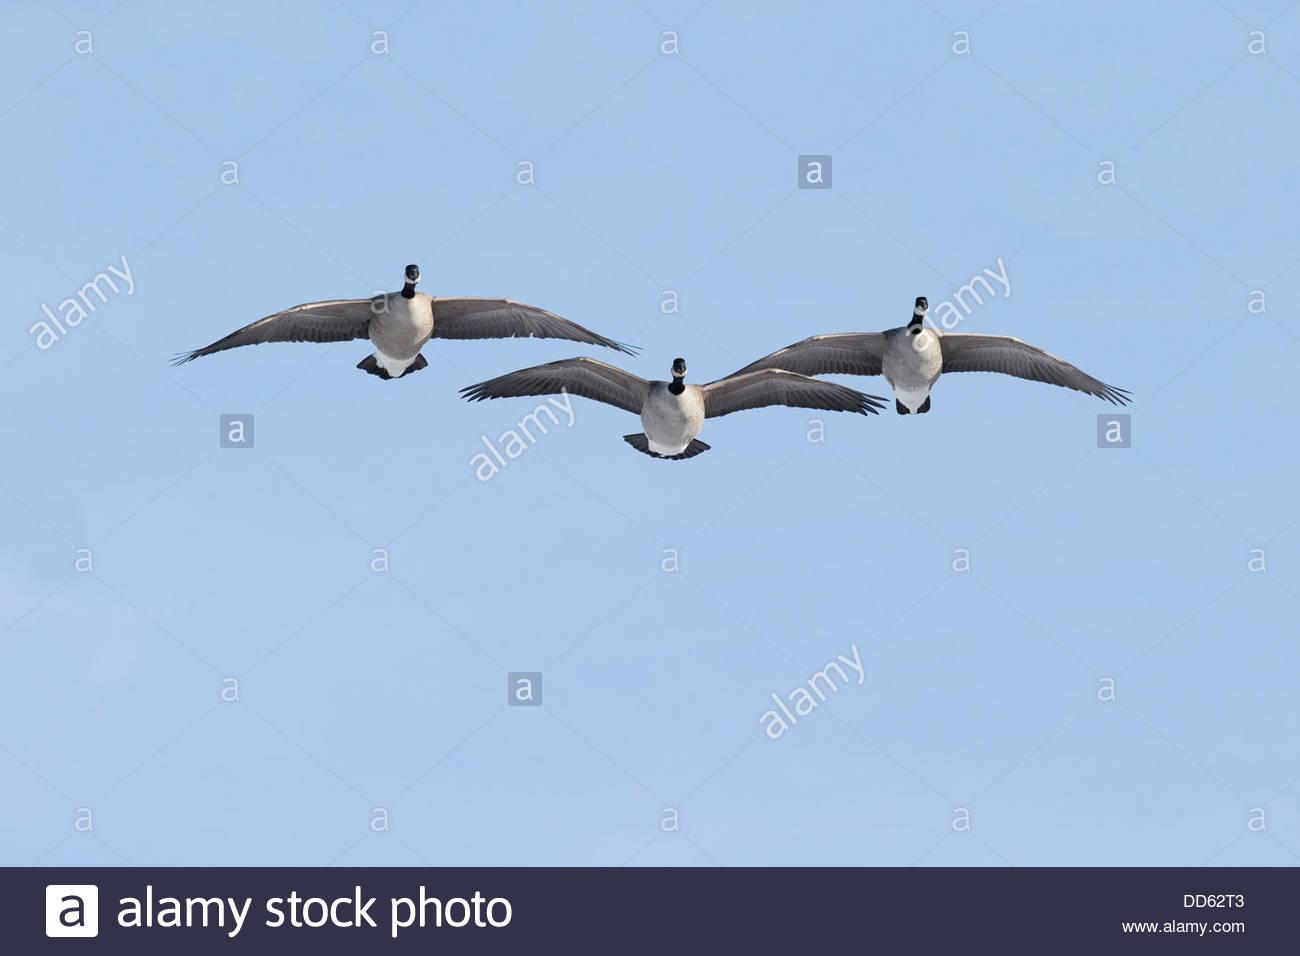 Canada Goose; Branta canadensis - Stock Image